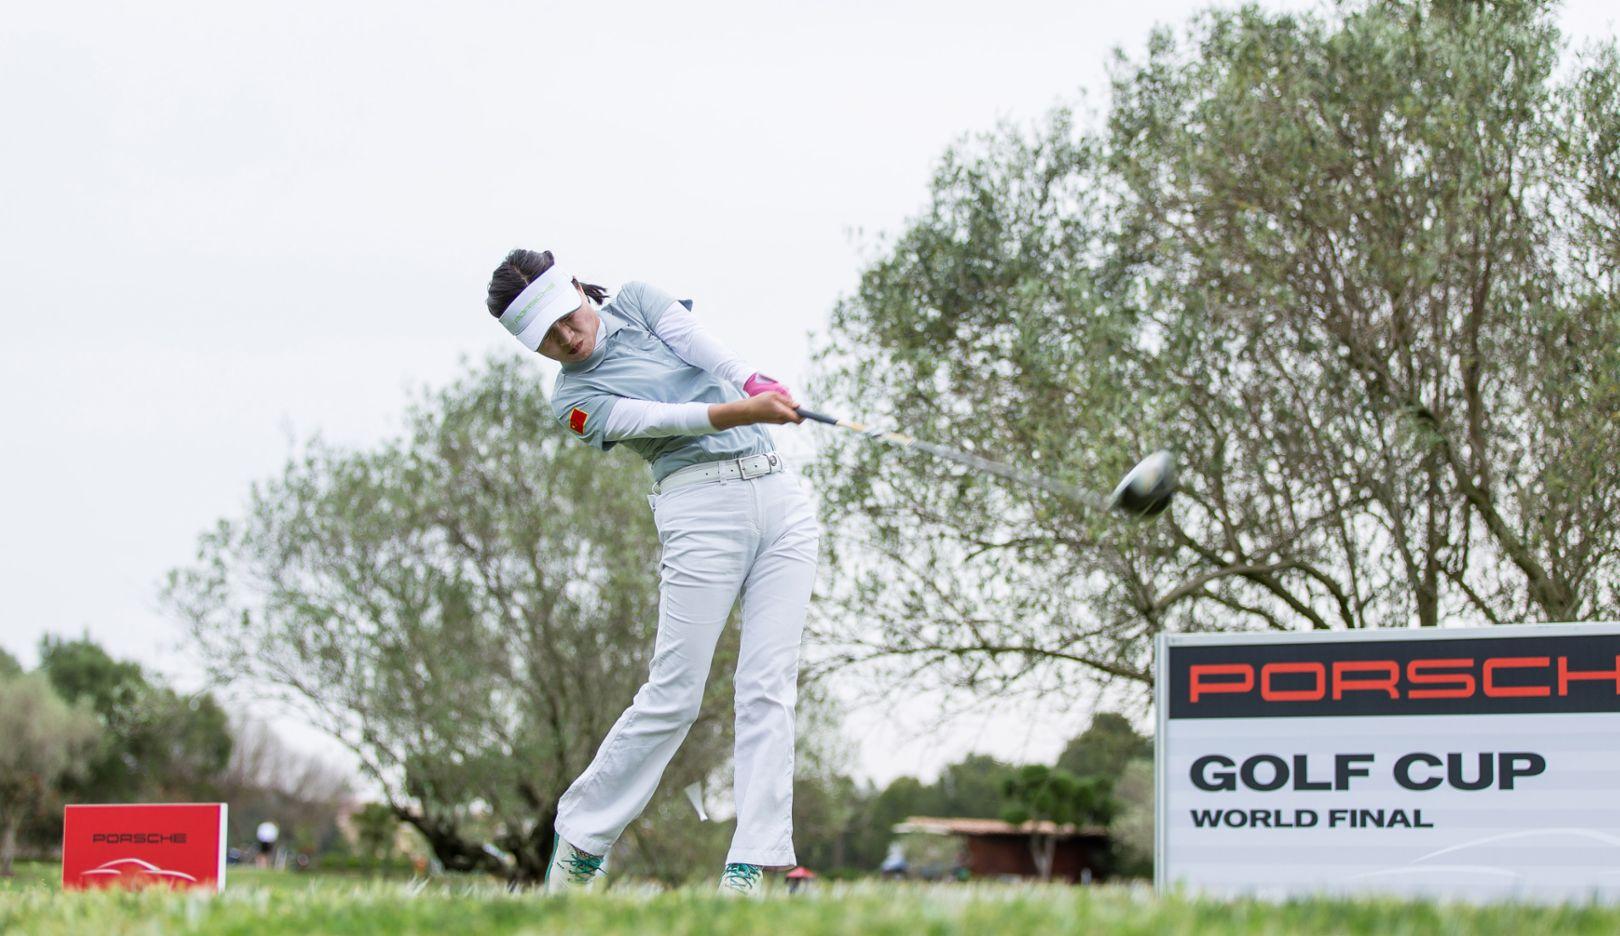 Porsche Golf Cup World Final, Mallorca, 2015, Porsche AG